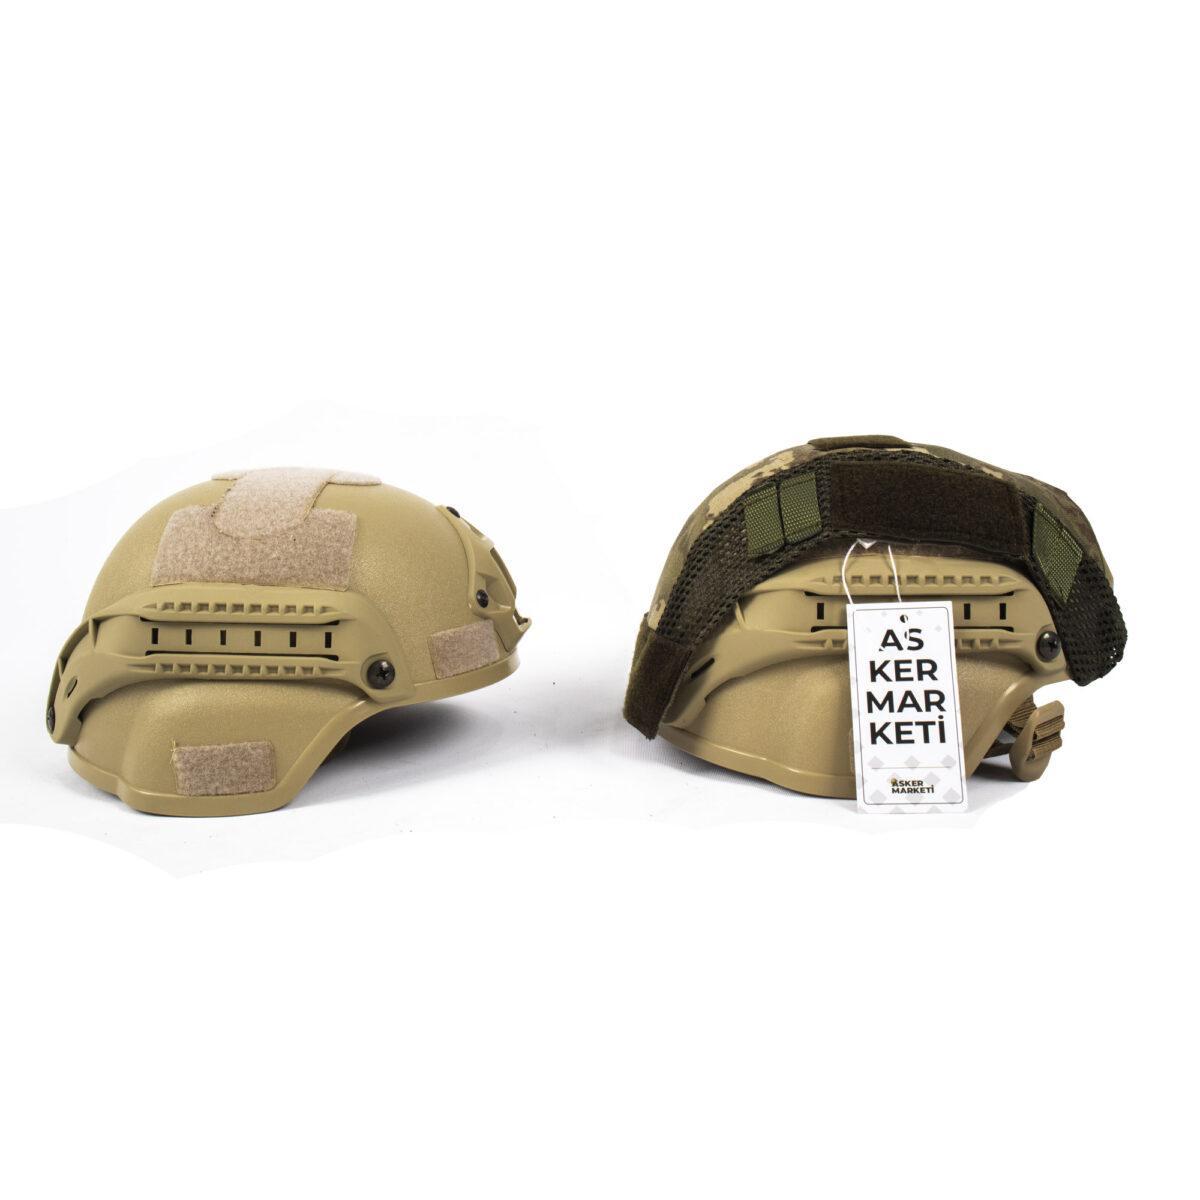 yeni tsk kamuflaj kask kilifi kisa askeri malzeme4